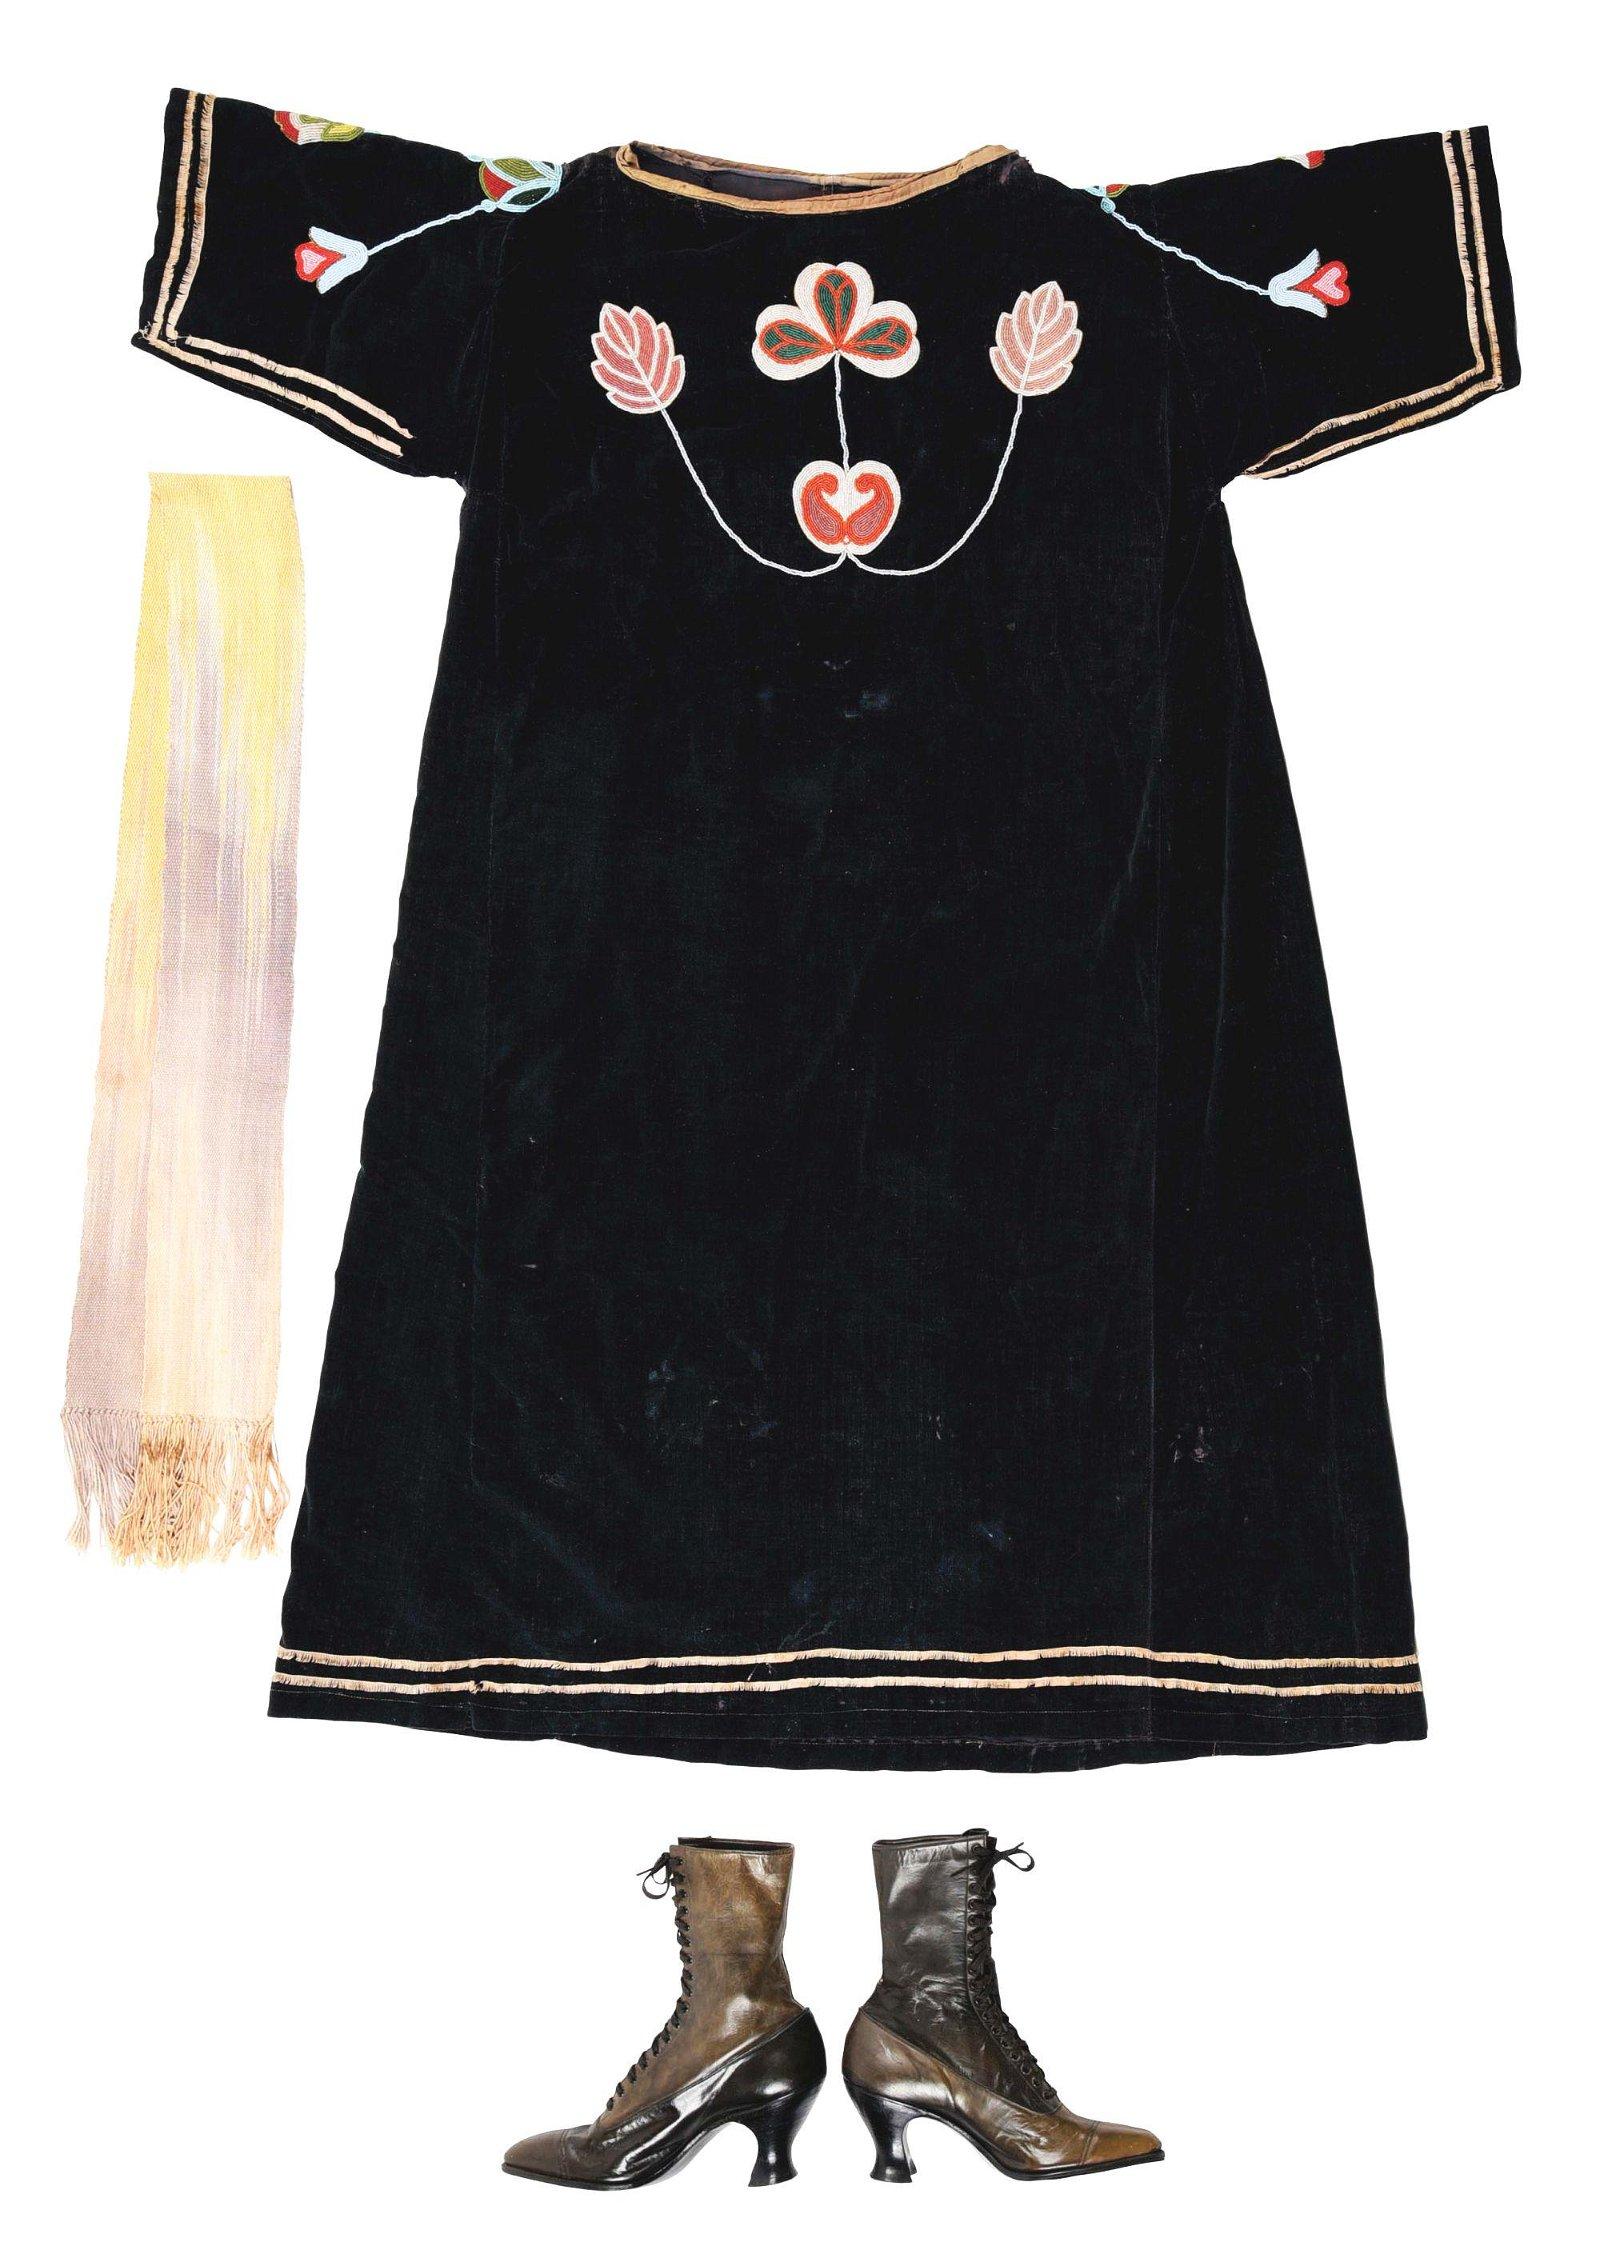 LOT OF 3: PLATEAU WOMAN'S BEADED CLOTH DRESS, SASH AND